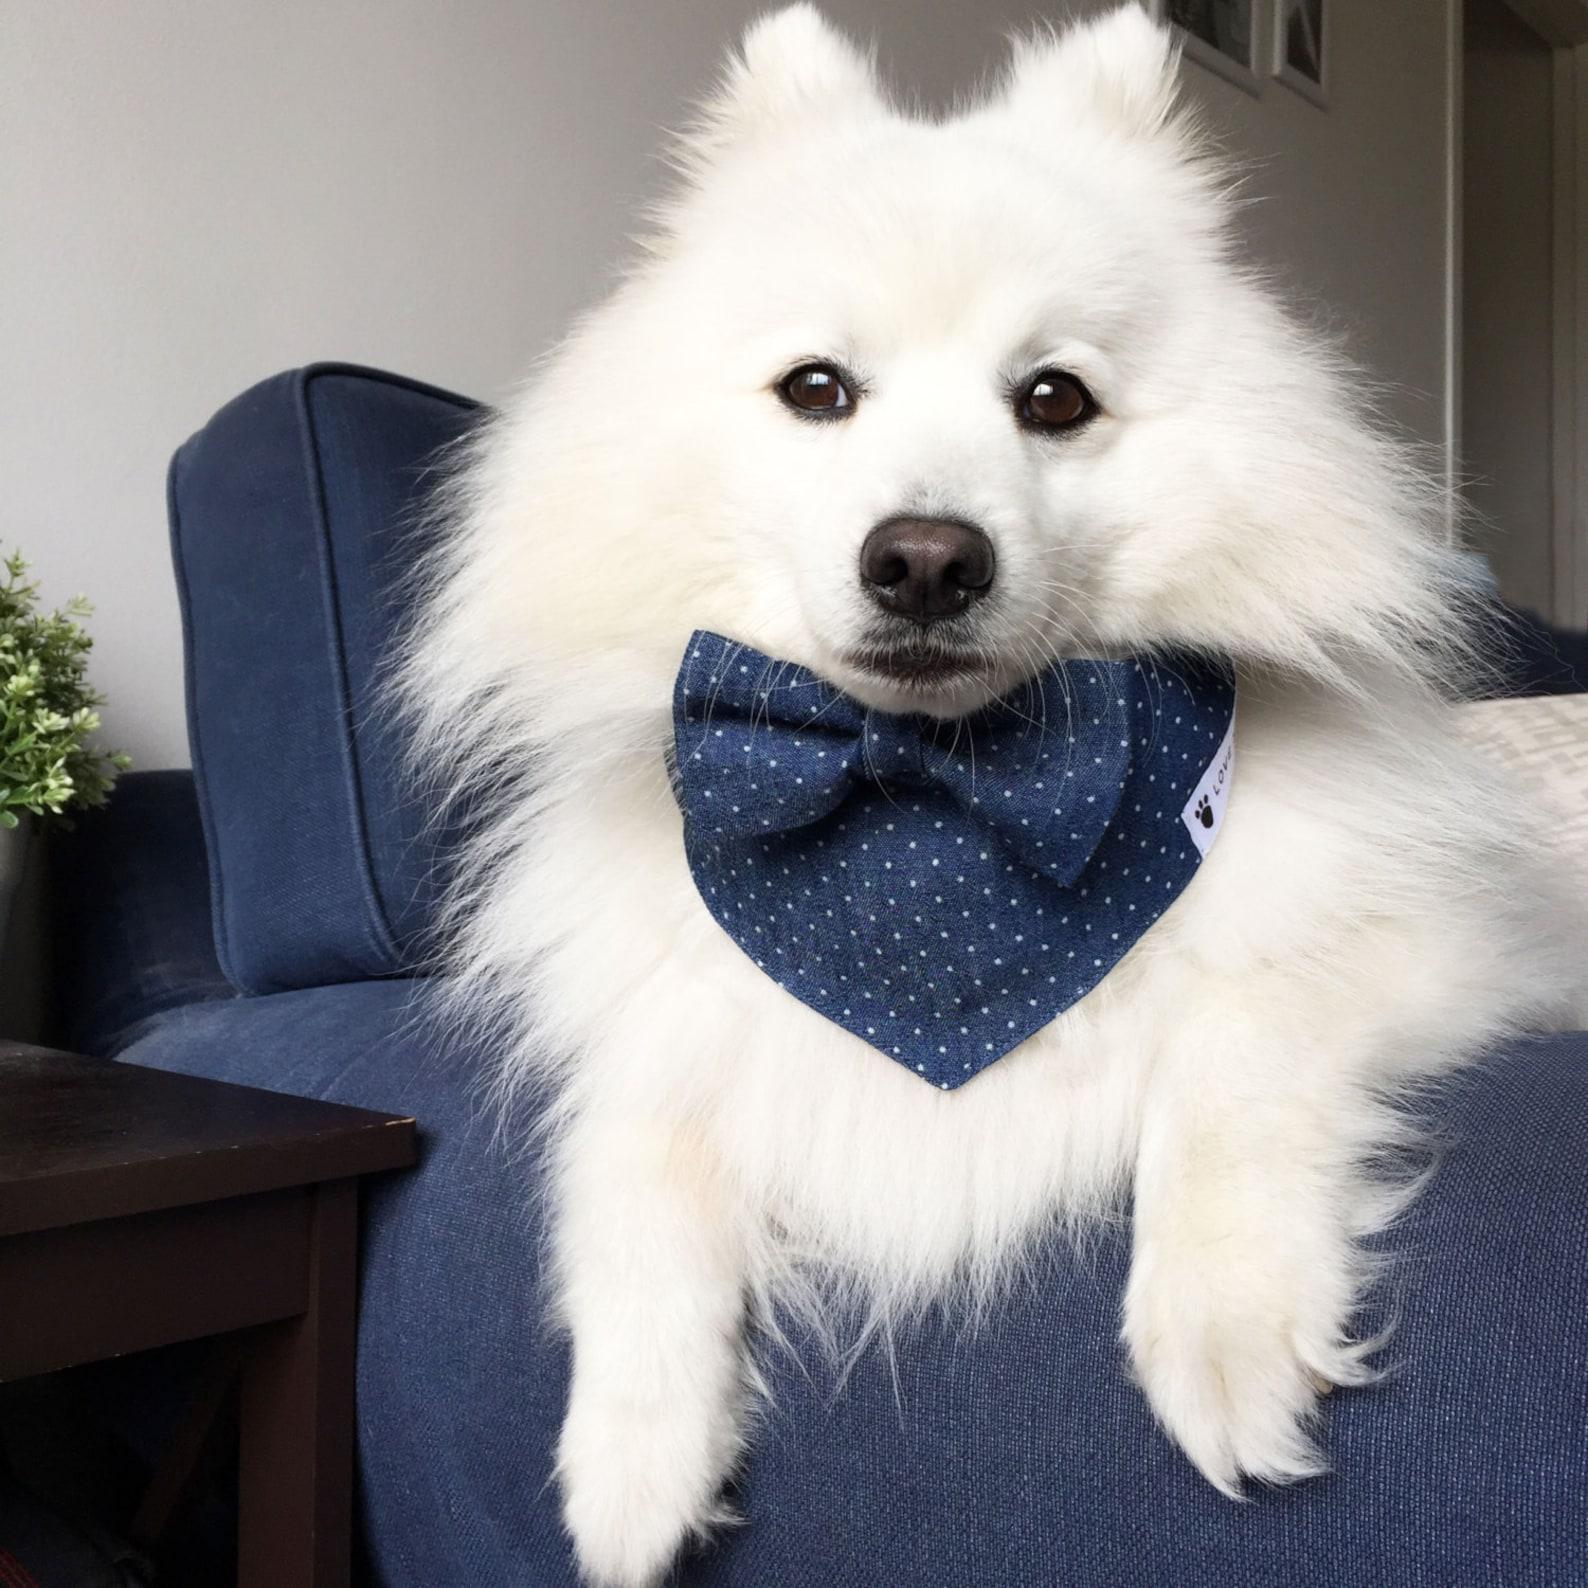 Dog wearing matching bow tie and bandana